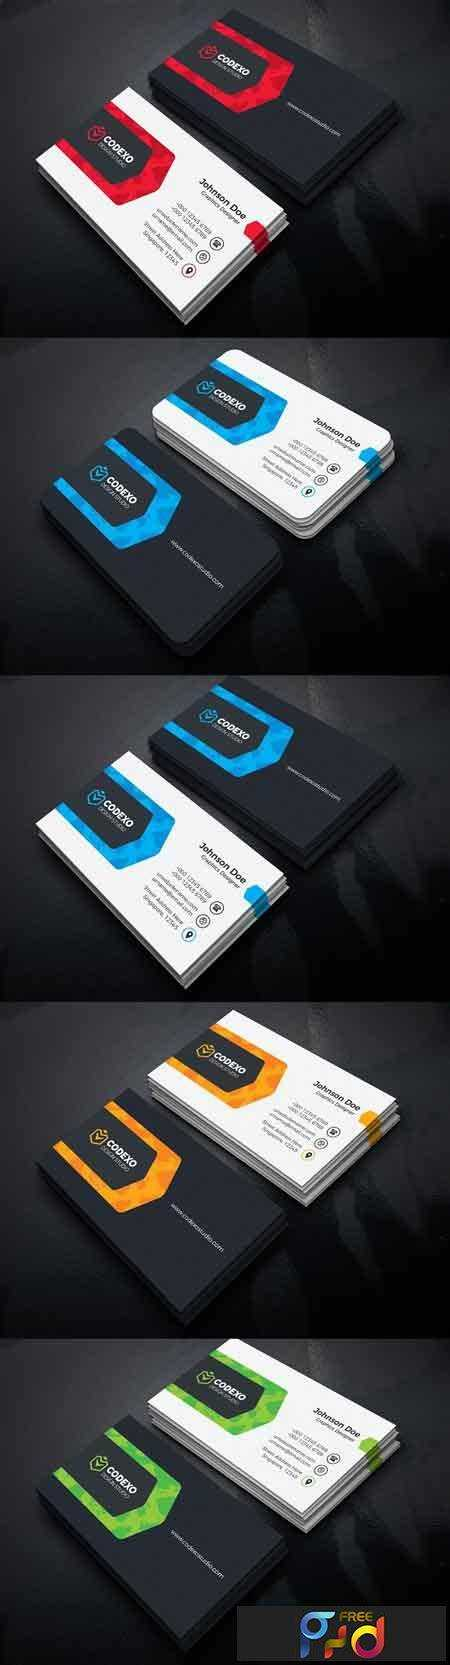 FreePsdVn.com_1705228_TEMPLATE_modern_business_card_1827646